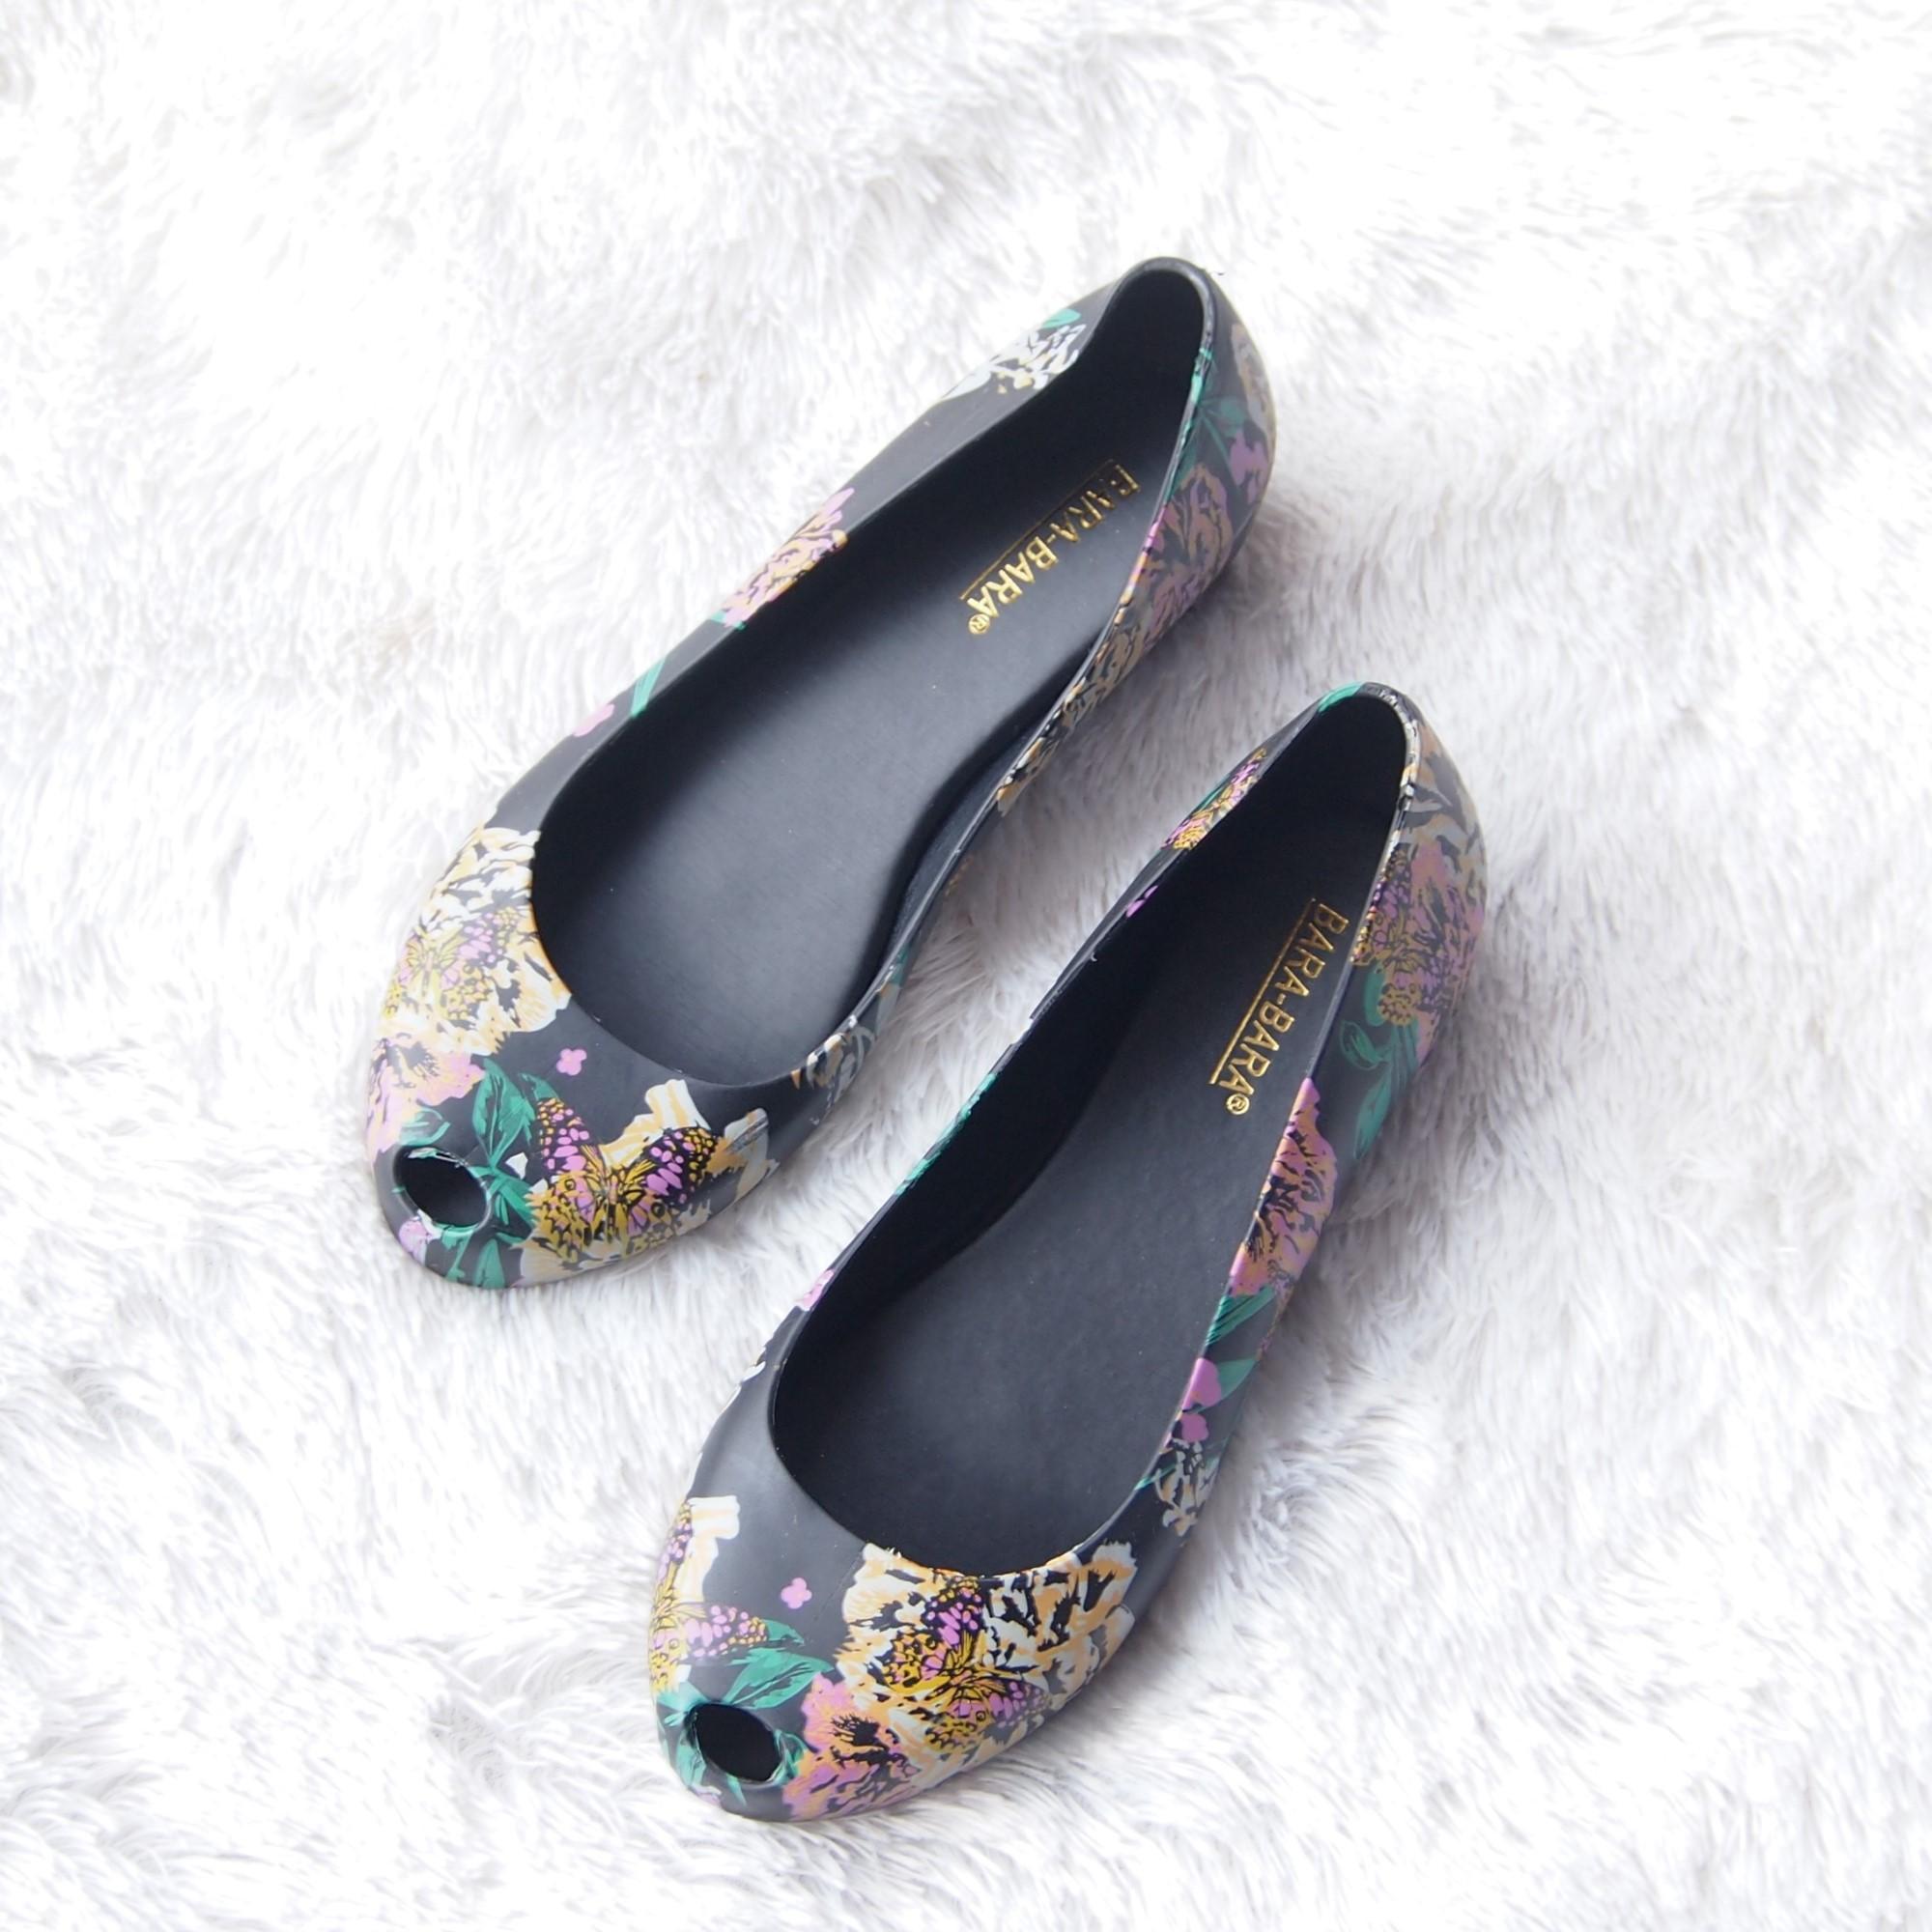 Harga Flat Shoes Jelly Wanita Sepatu Balet Bara Bara Motif Bunga 1838msb Warna Dikirim Random Harga Rp 54.600